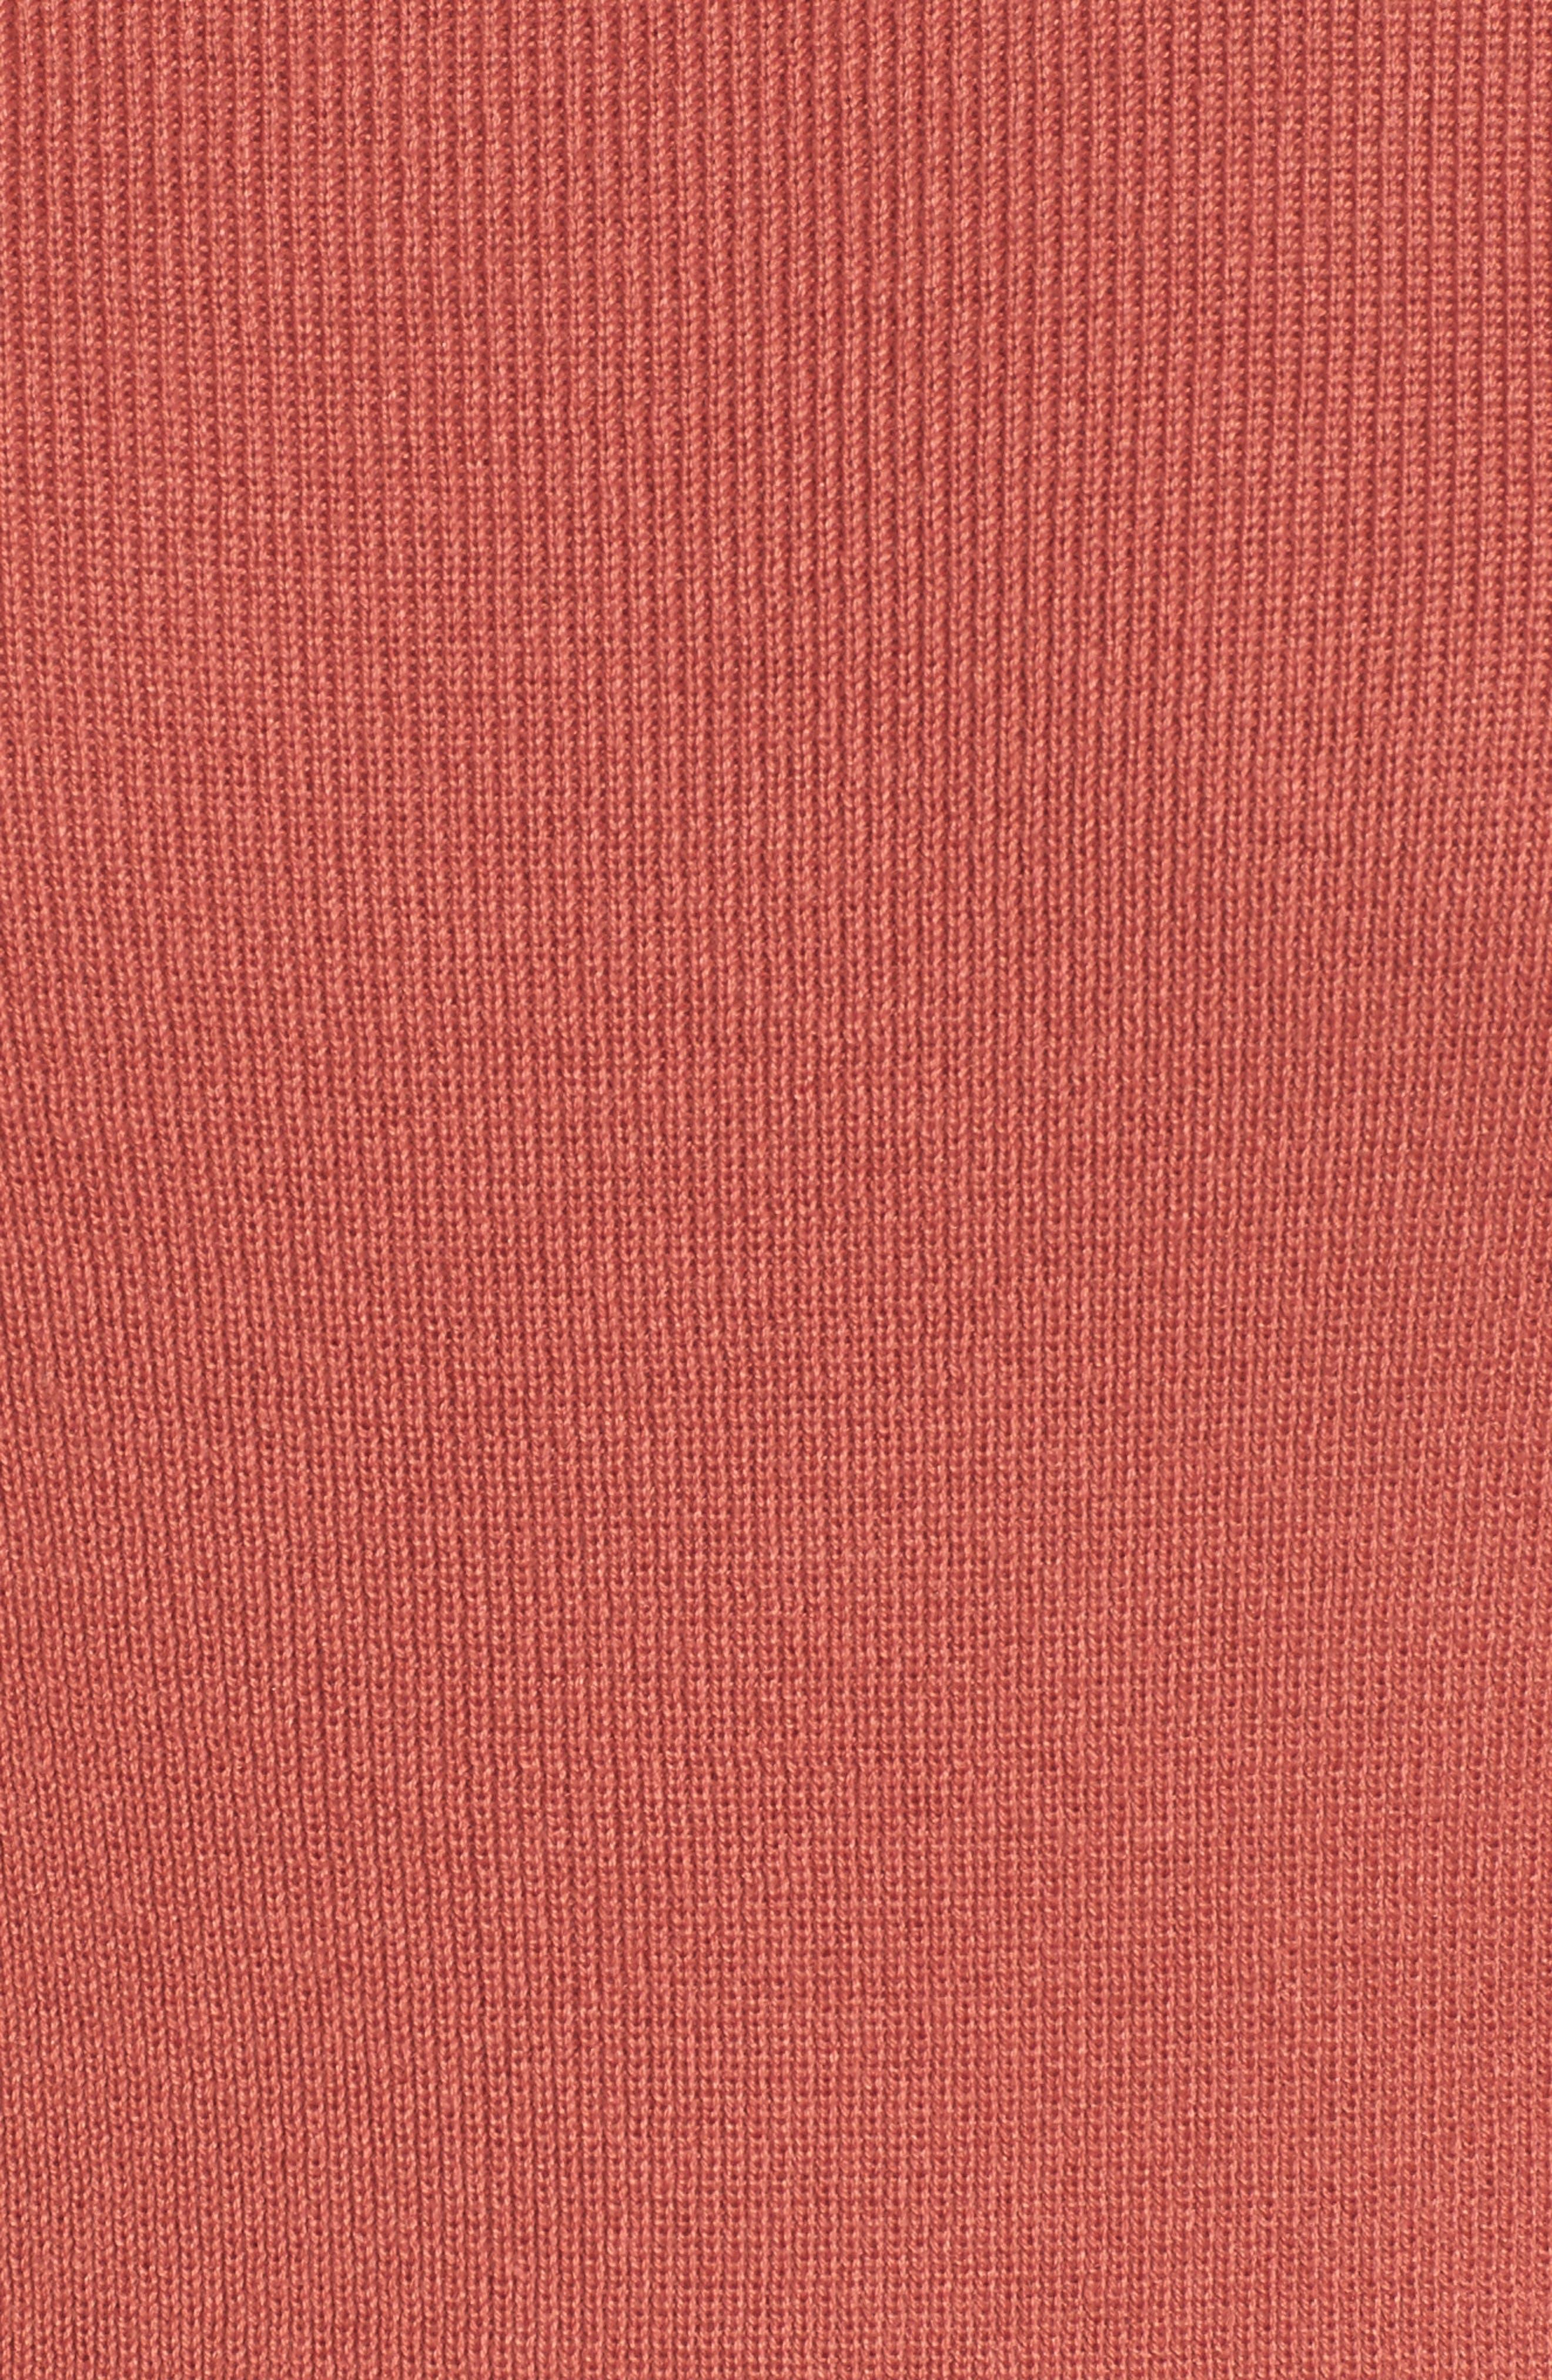 Bell Sleeve Rib Sweater,                             Alternate thumbnail 20, color,